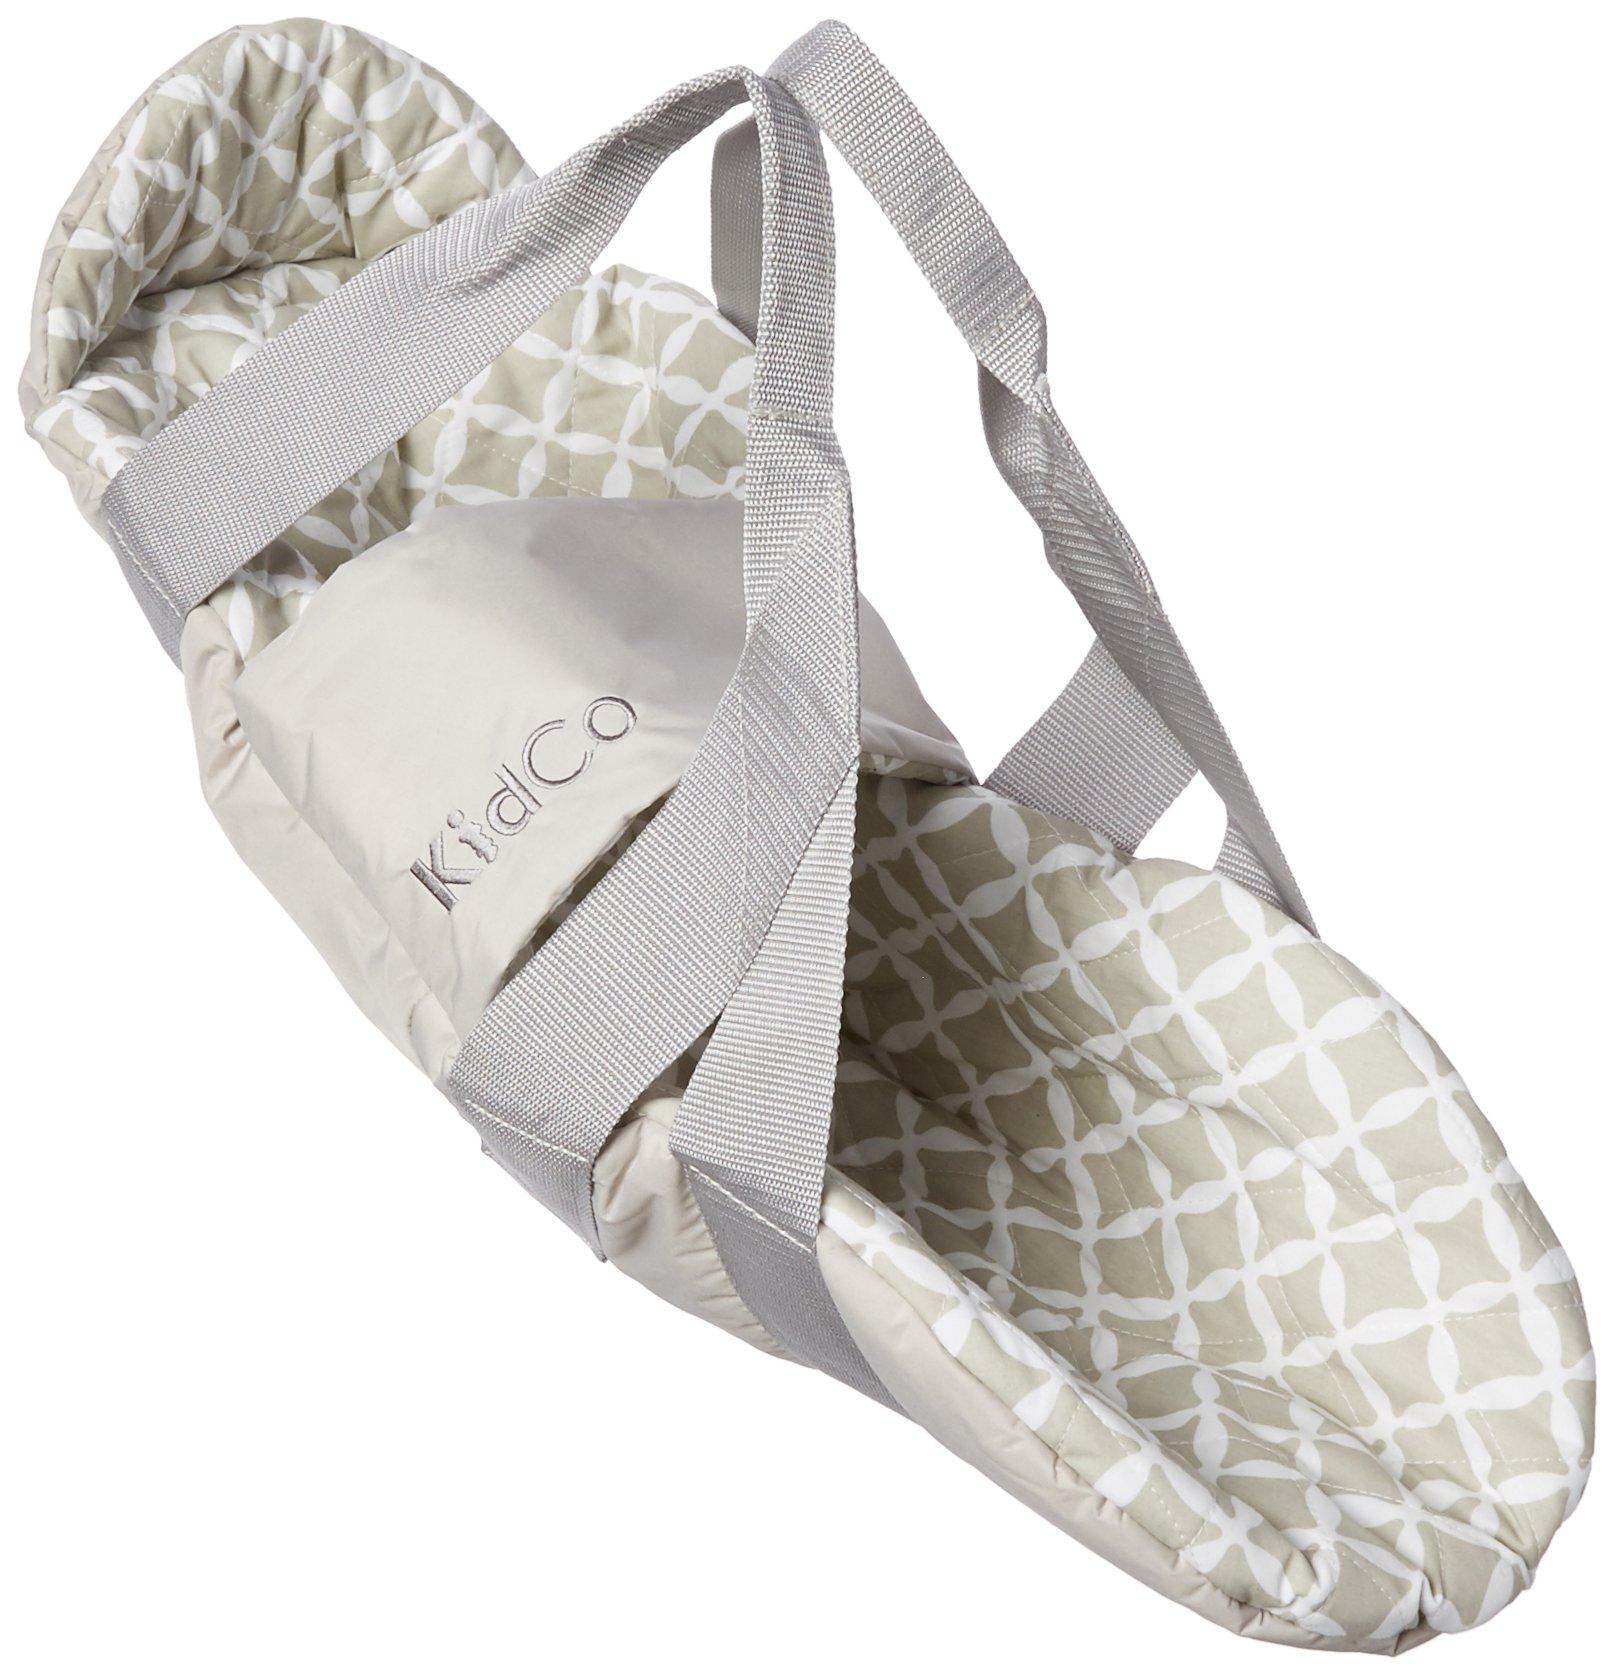 KidCo Swingpod Infant Portable Swaddle Swing, Gray